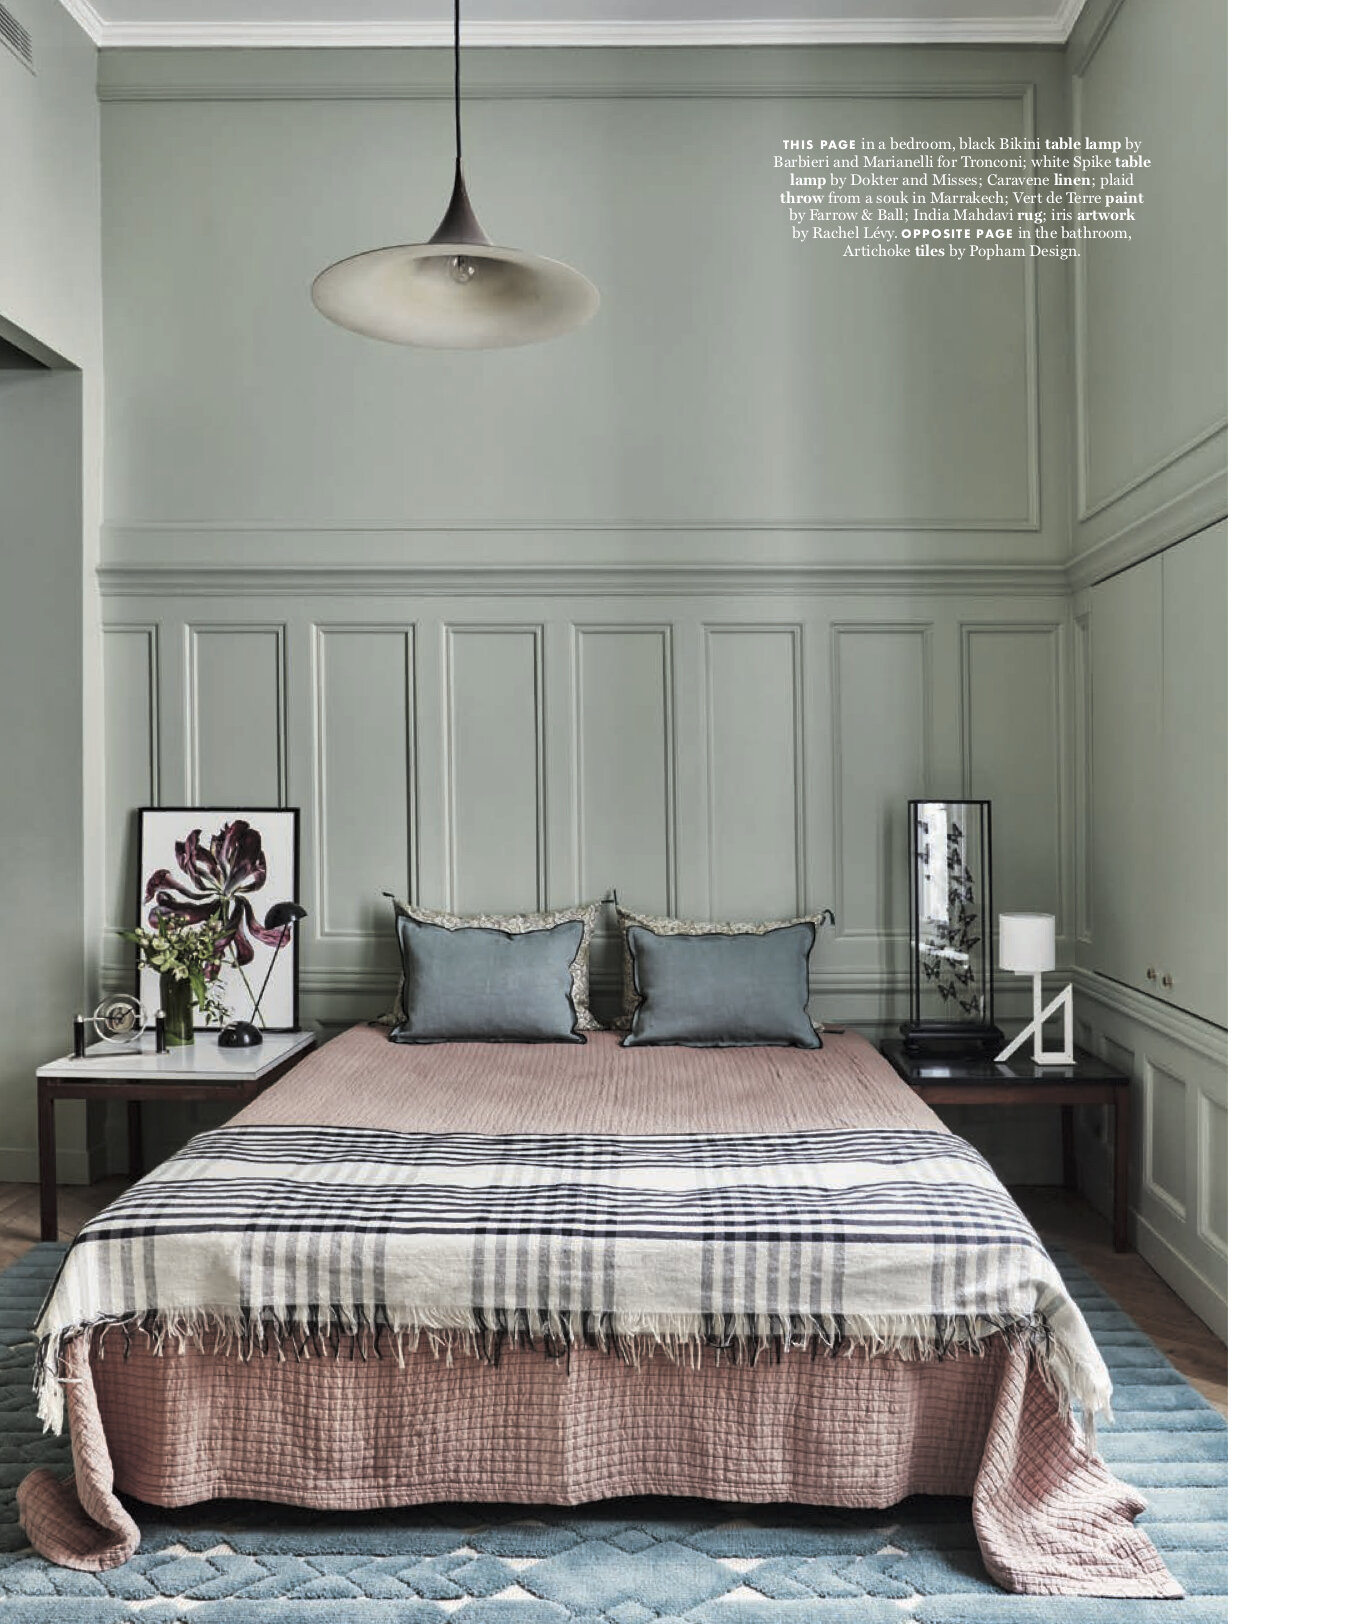 Studio Maddox - Vogue Living - pg 129.jpg